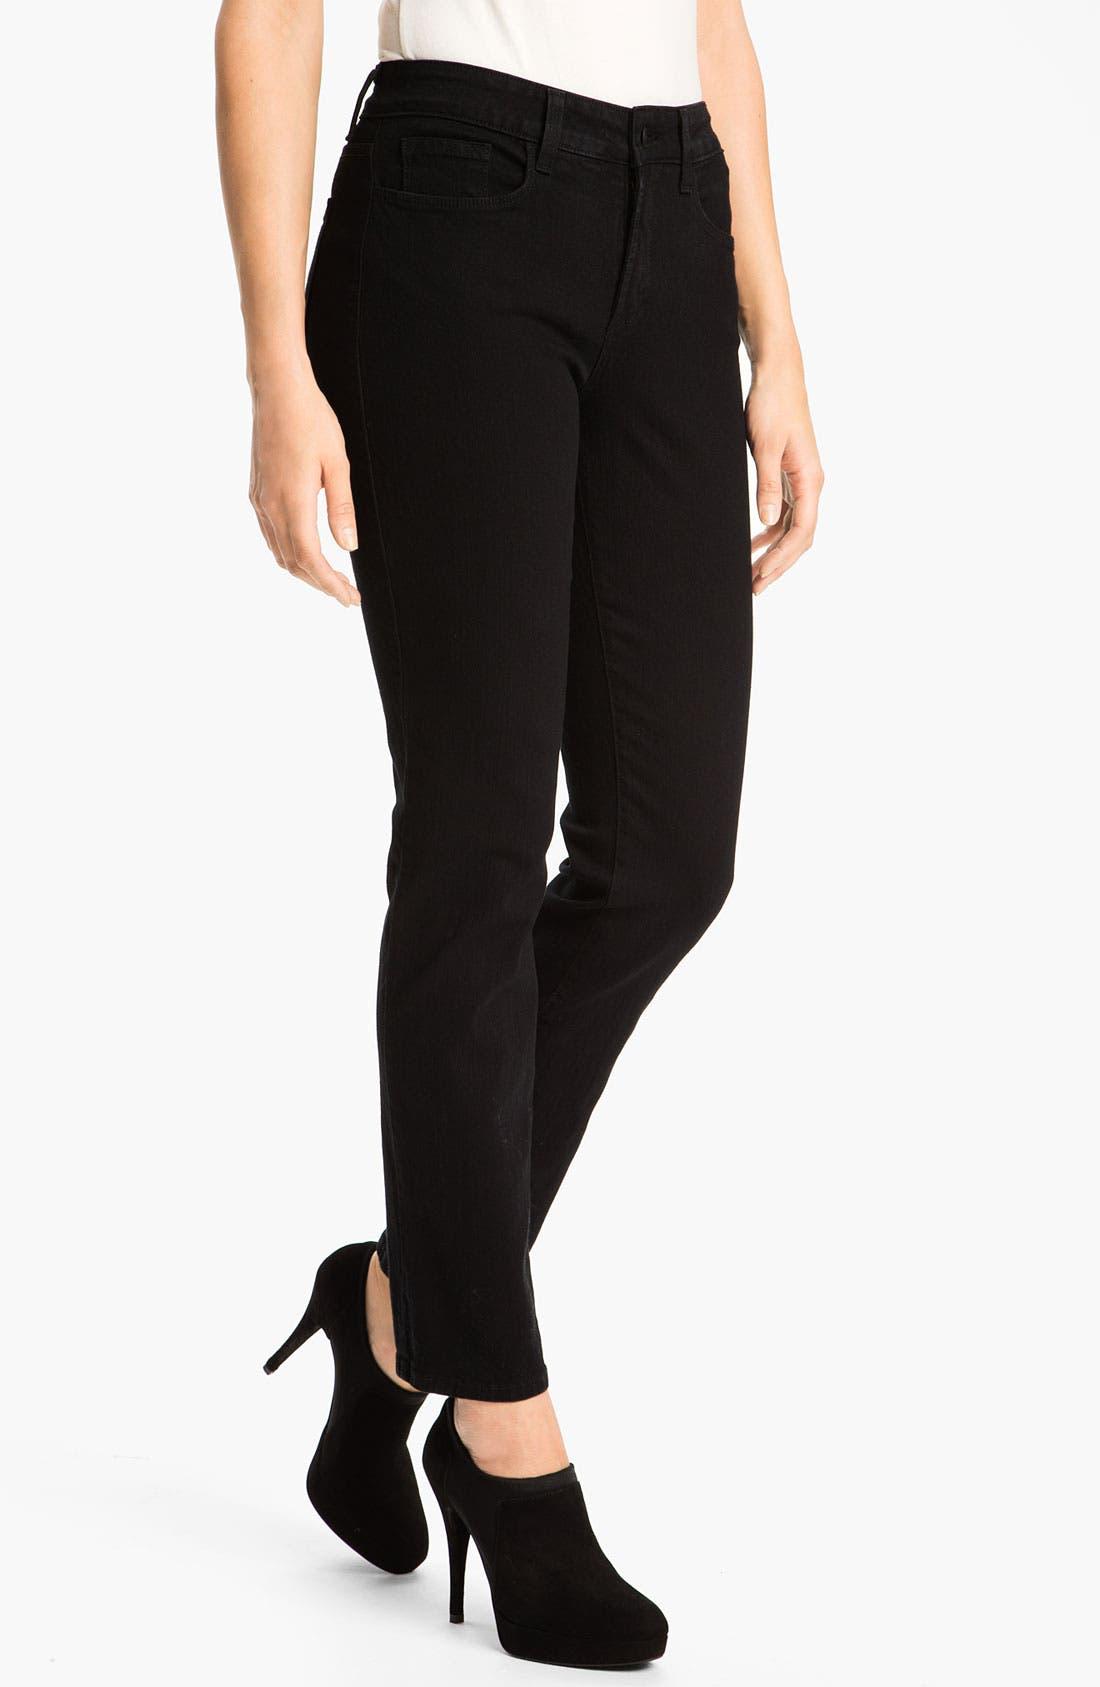 Main Image - NYDJ 'Sheri' Stretch Skinny Jeans (Black) (Regular & Petite)